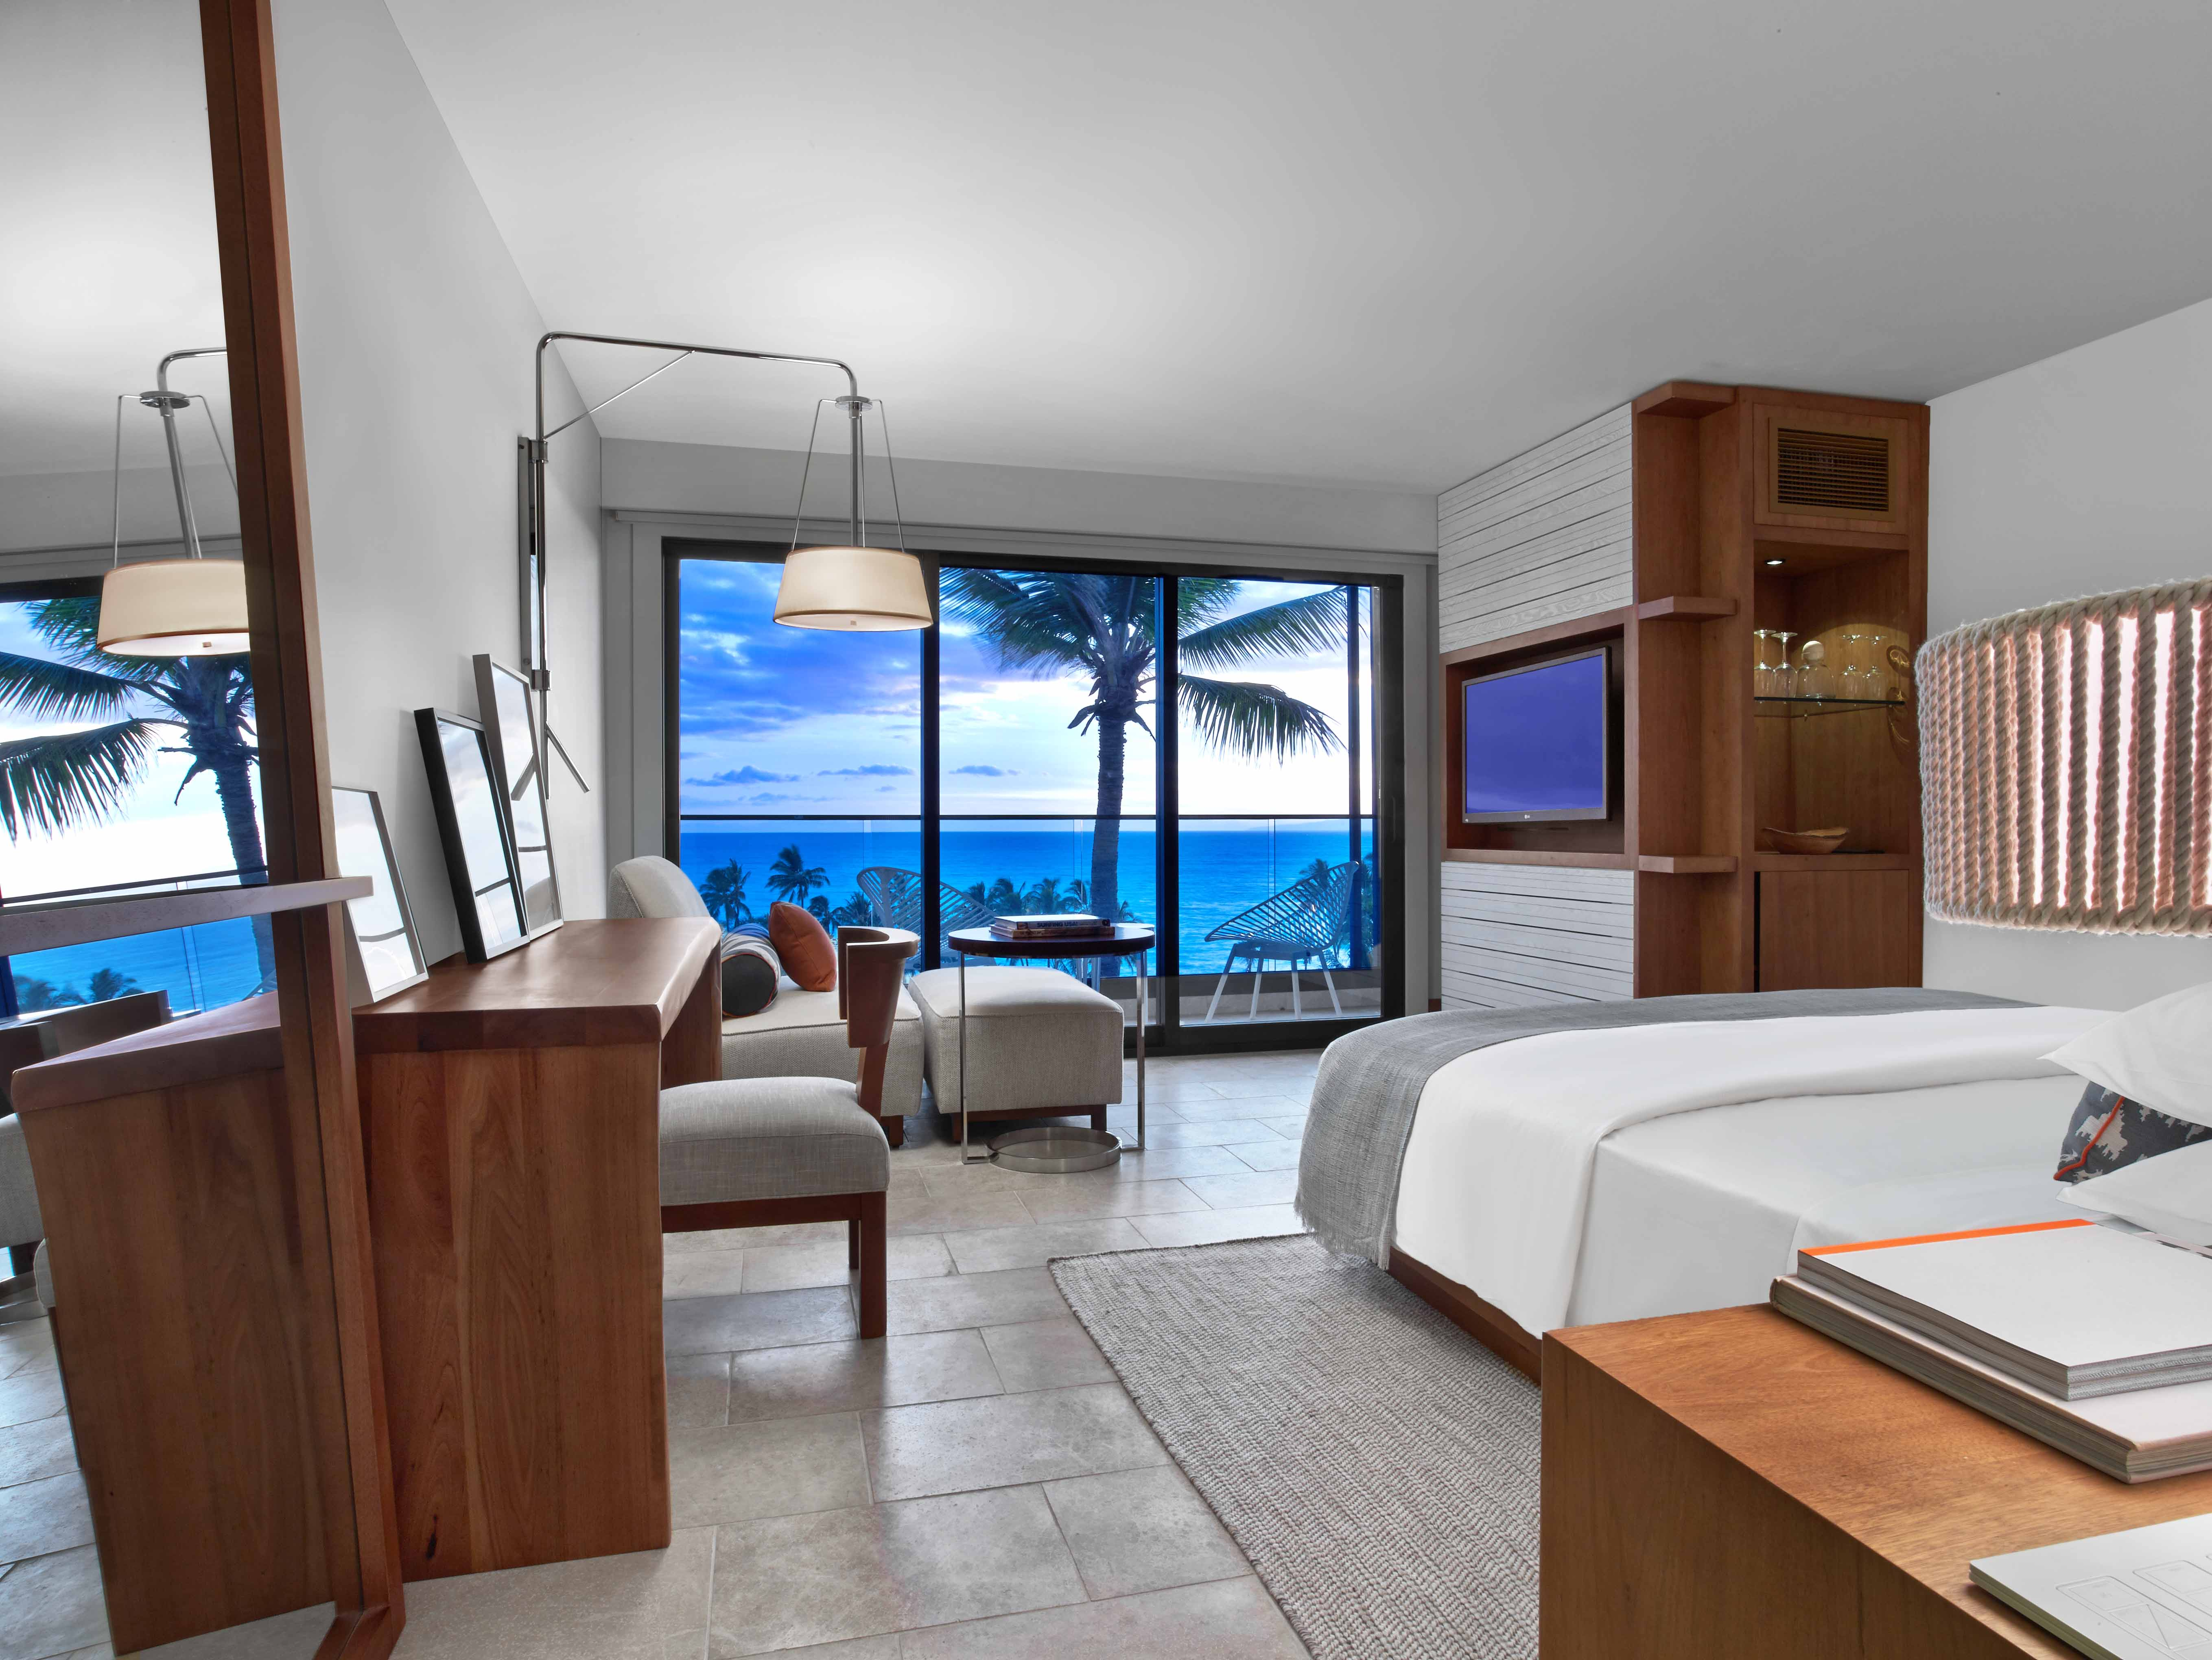 Andaz Maui Room